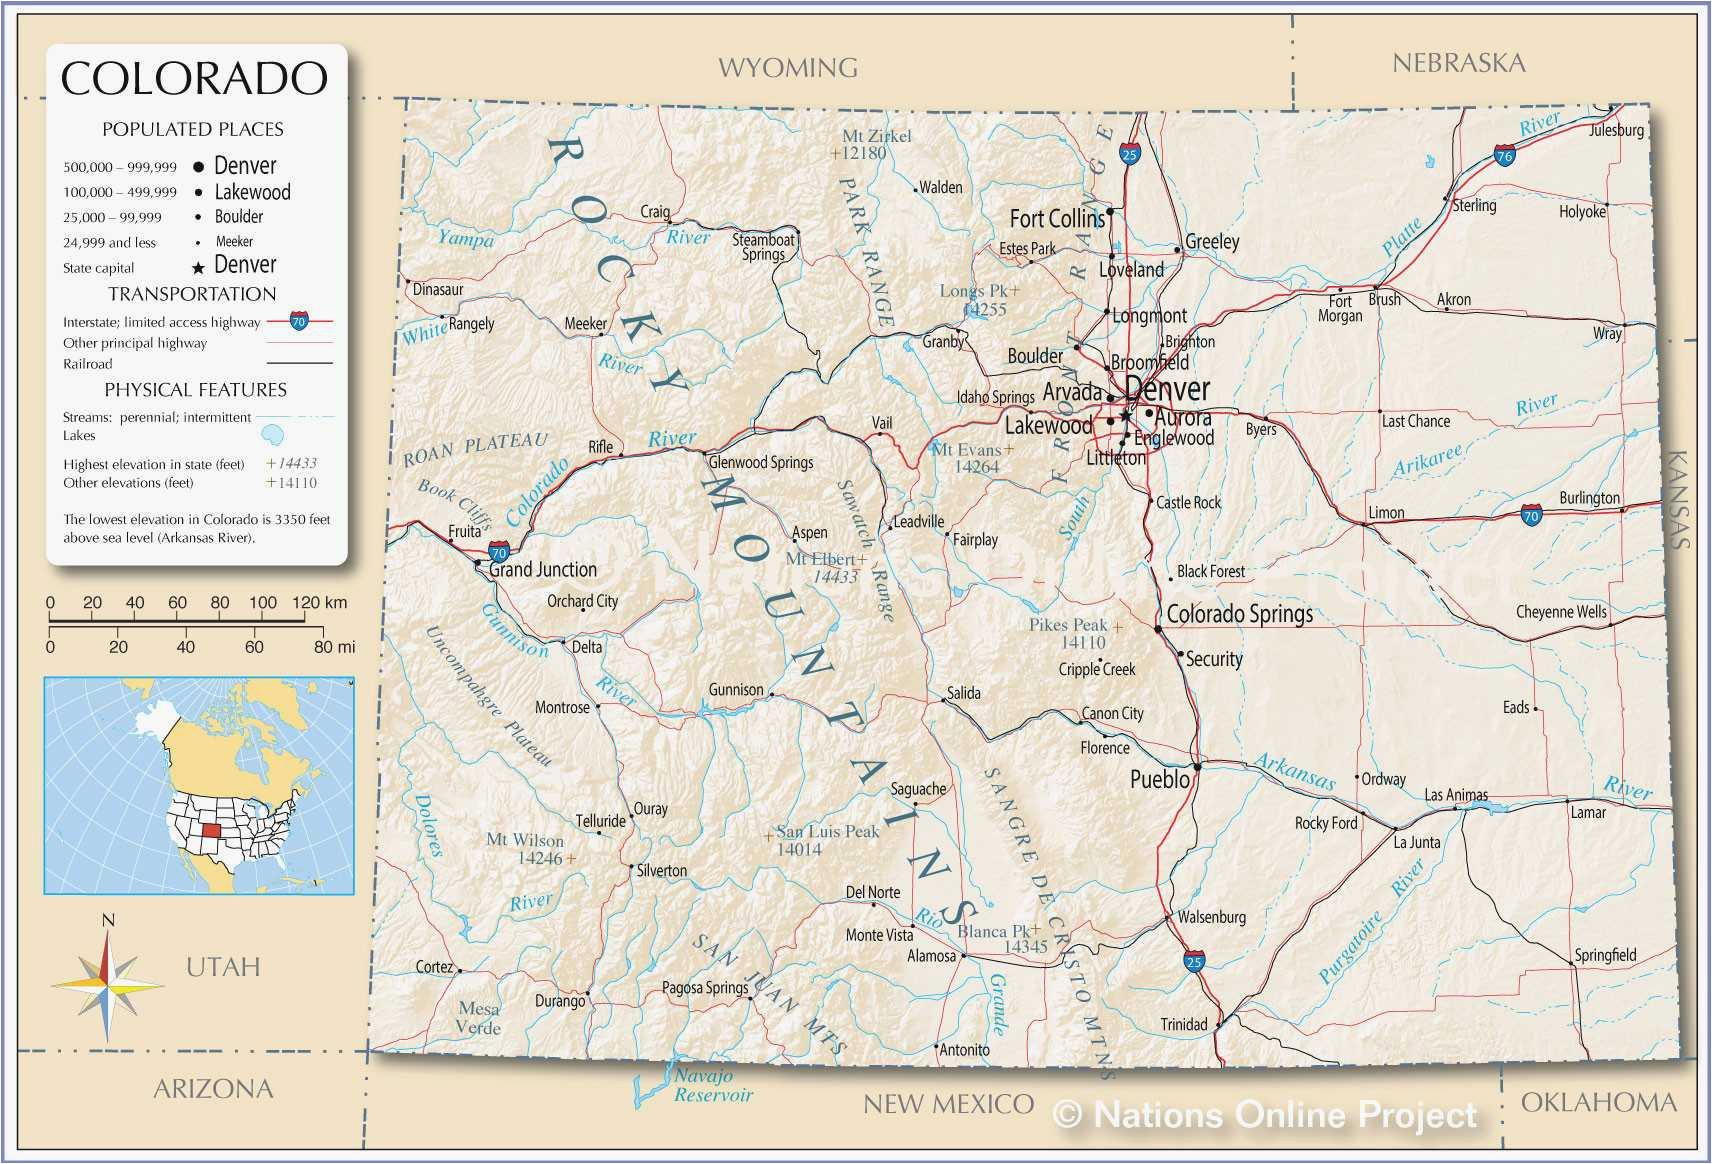 denver county map lovely denver county map beautiful city map denver